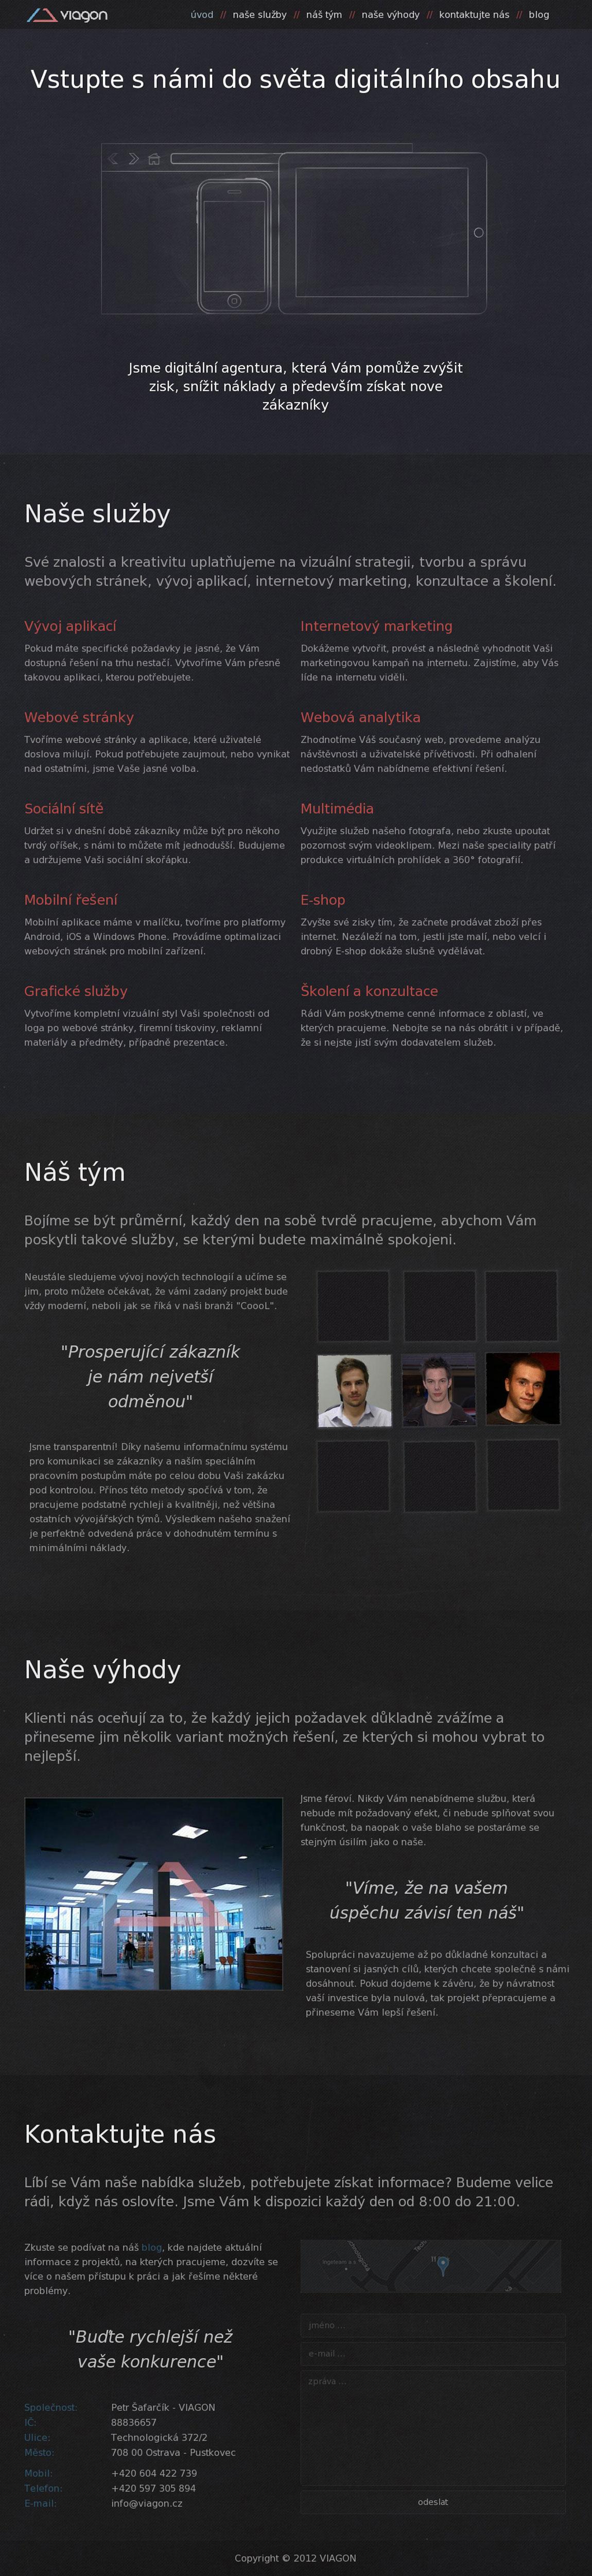 Viagon Website Screenshot